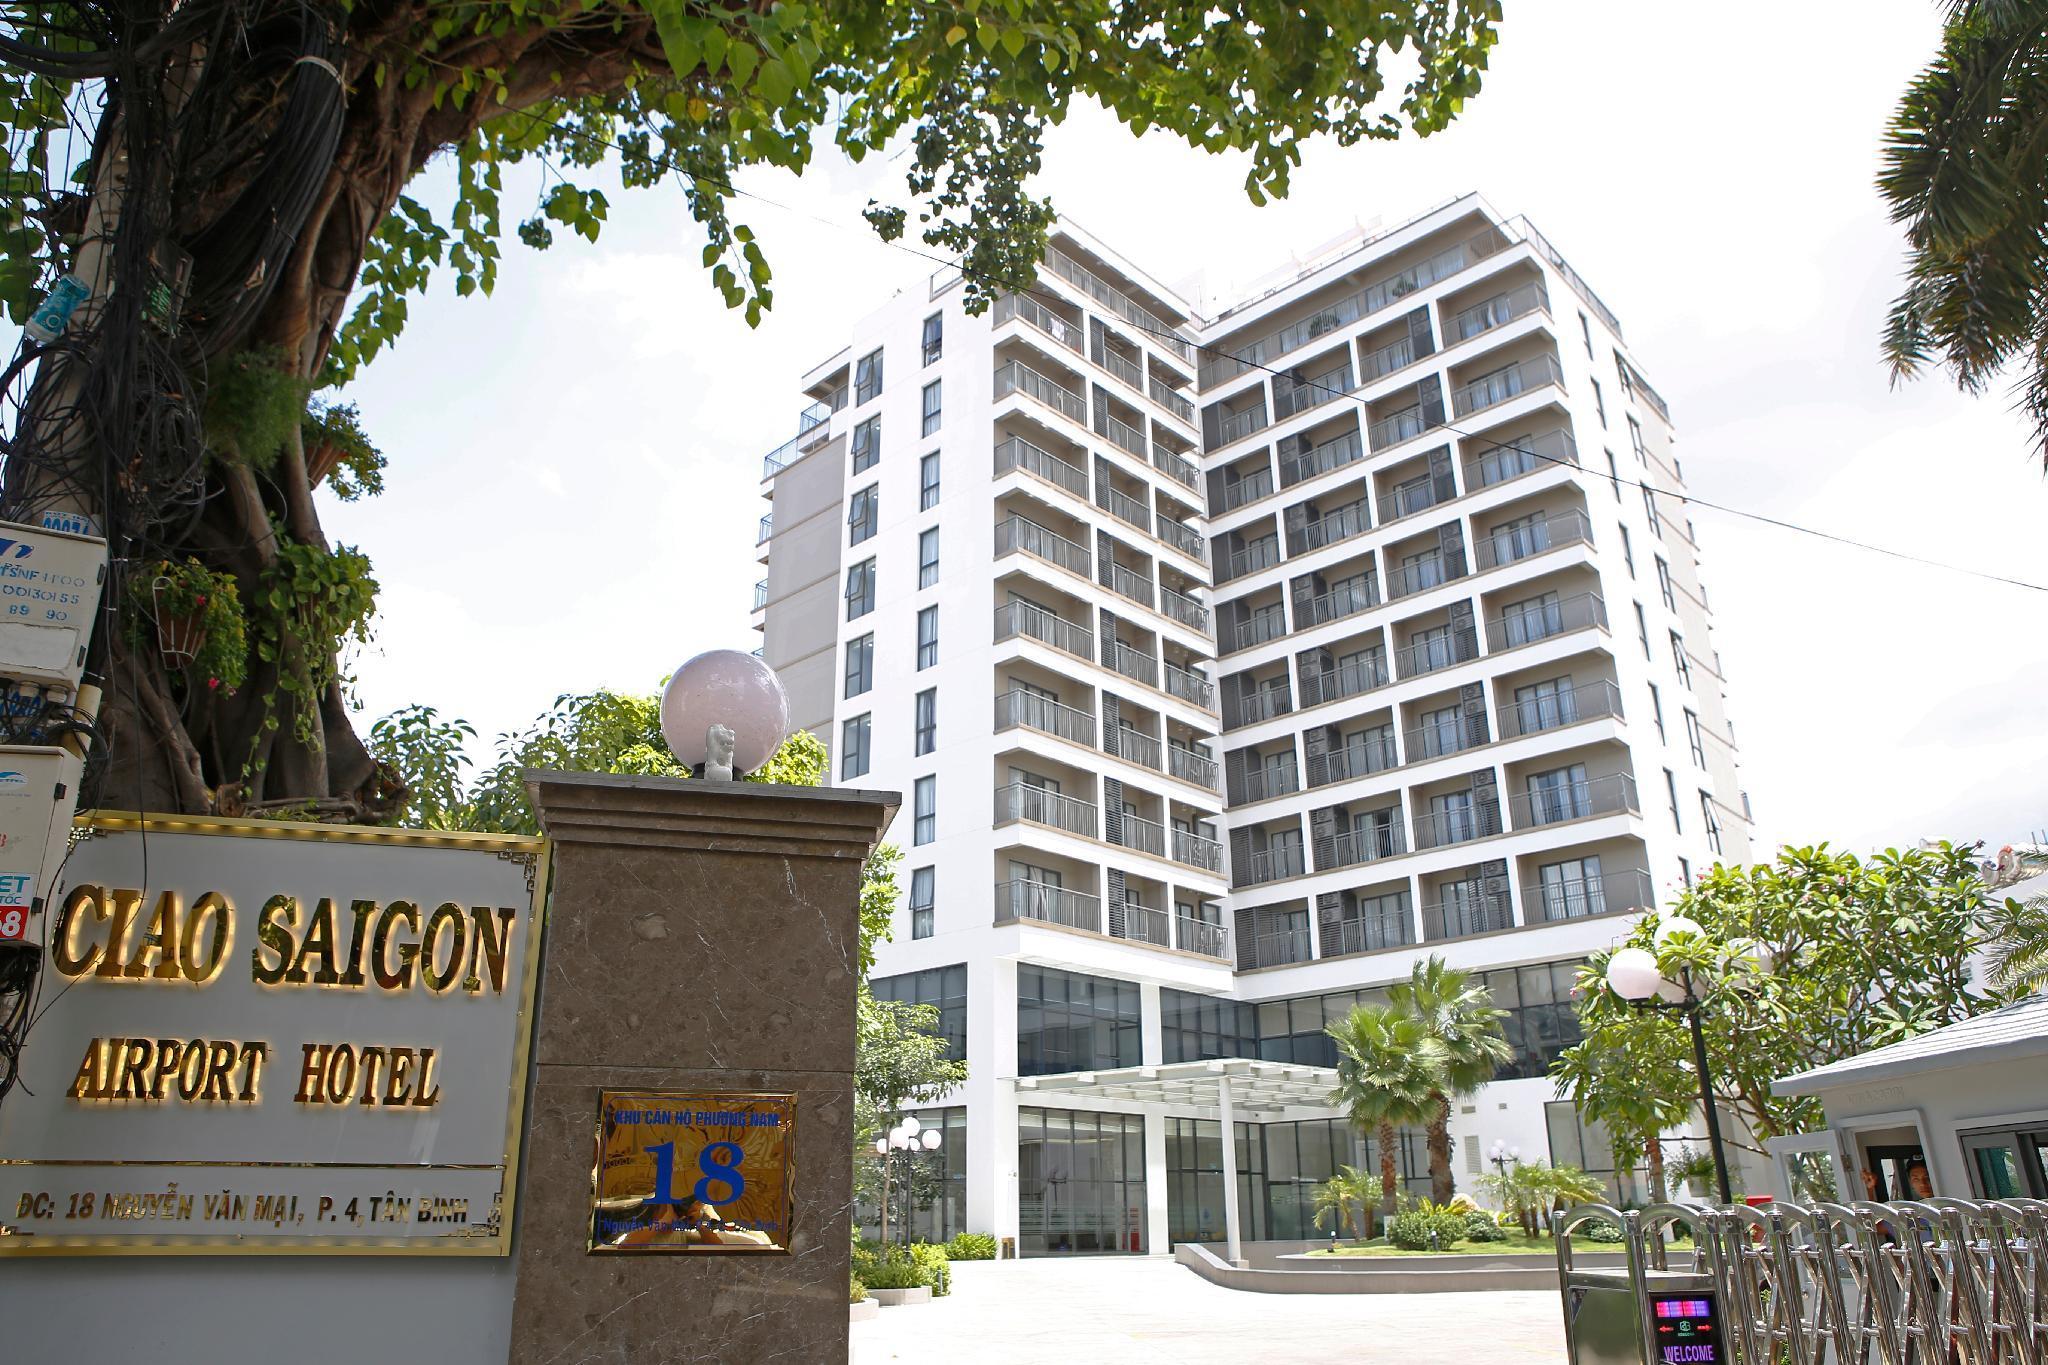 Ciao SaiGon Airport Hotel And Apartment